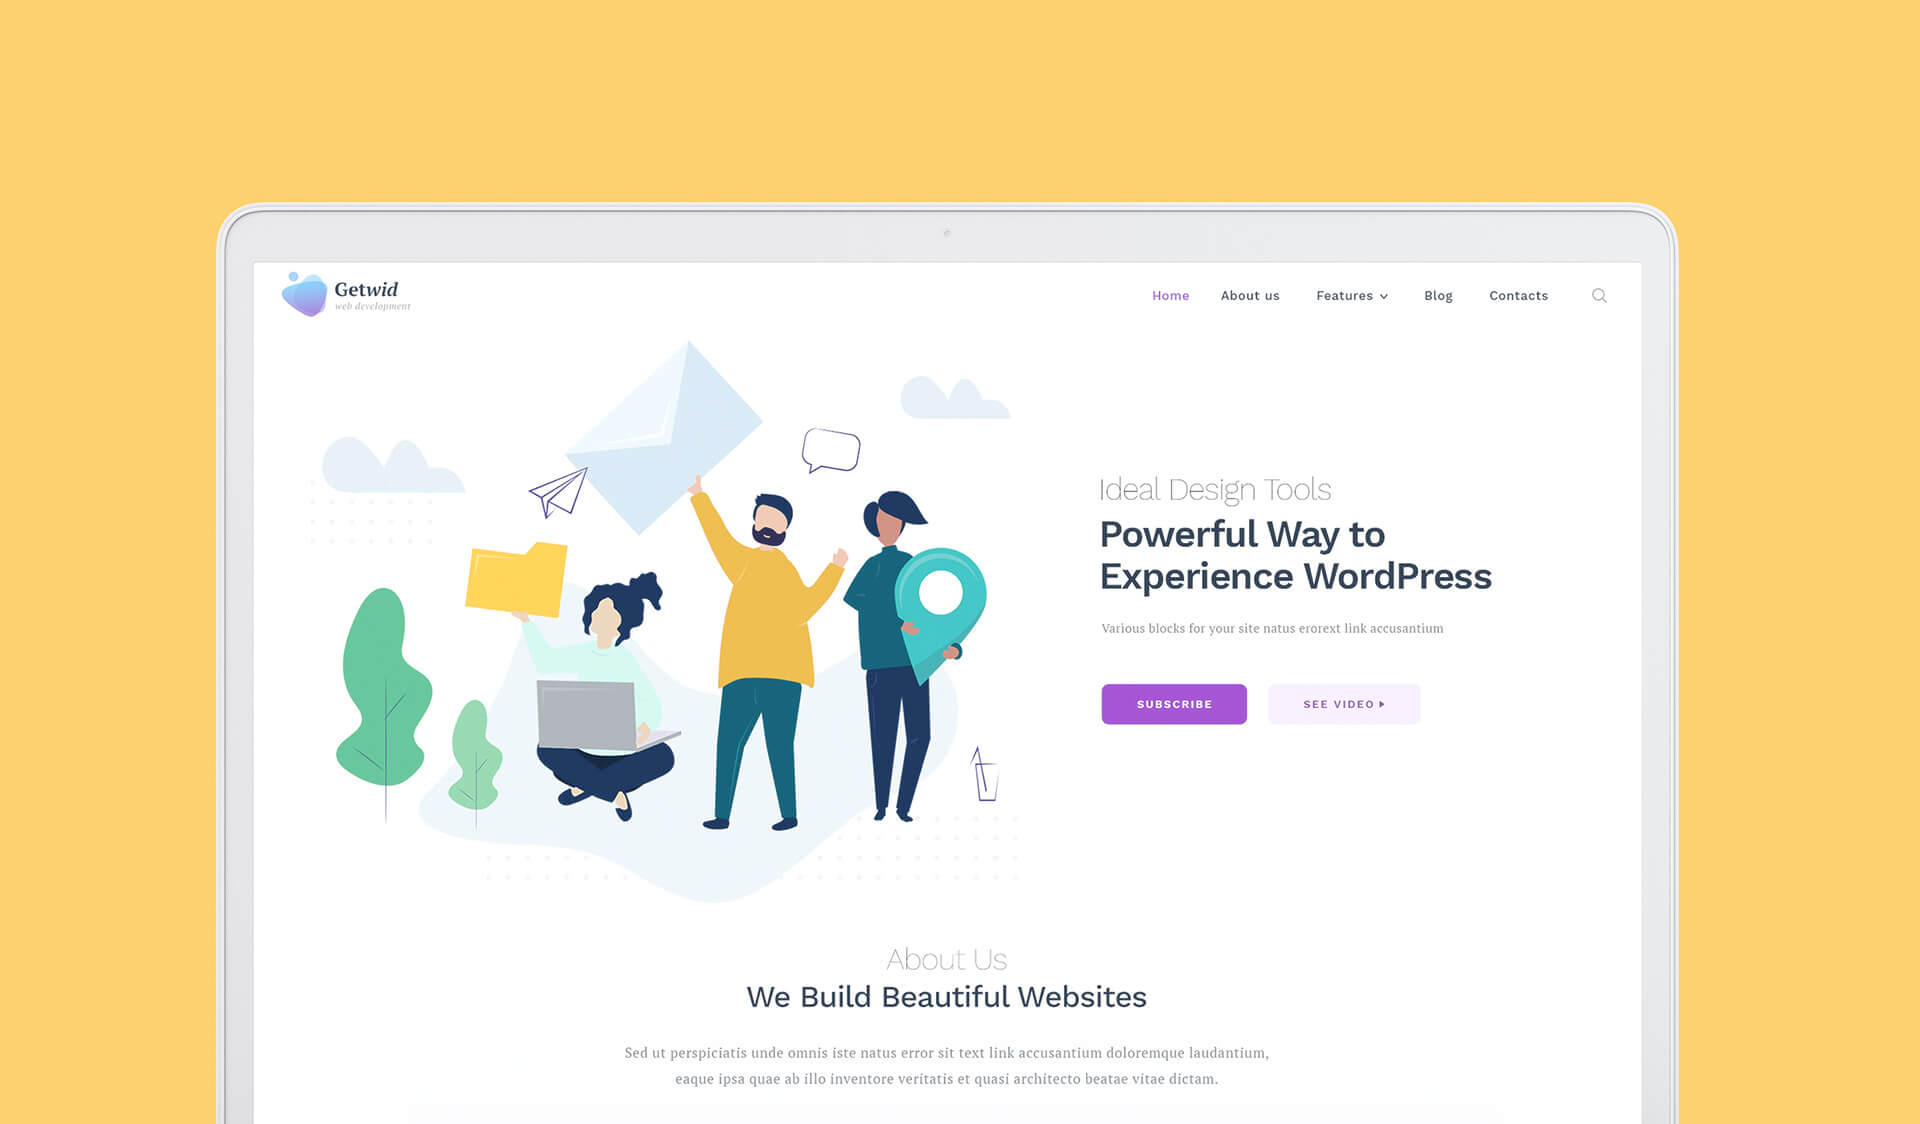 Image Hotspot WordPress Block